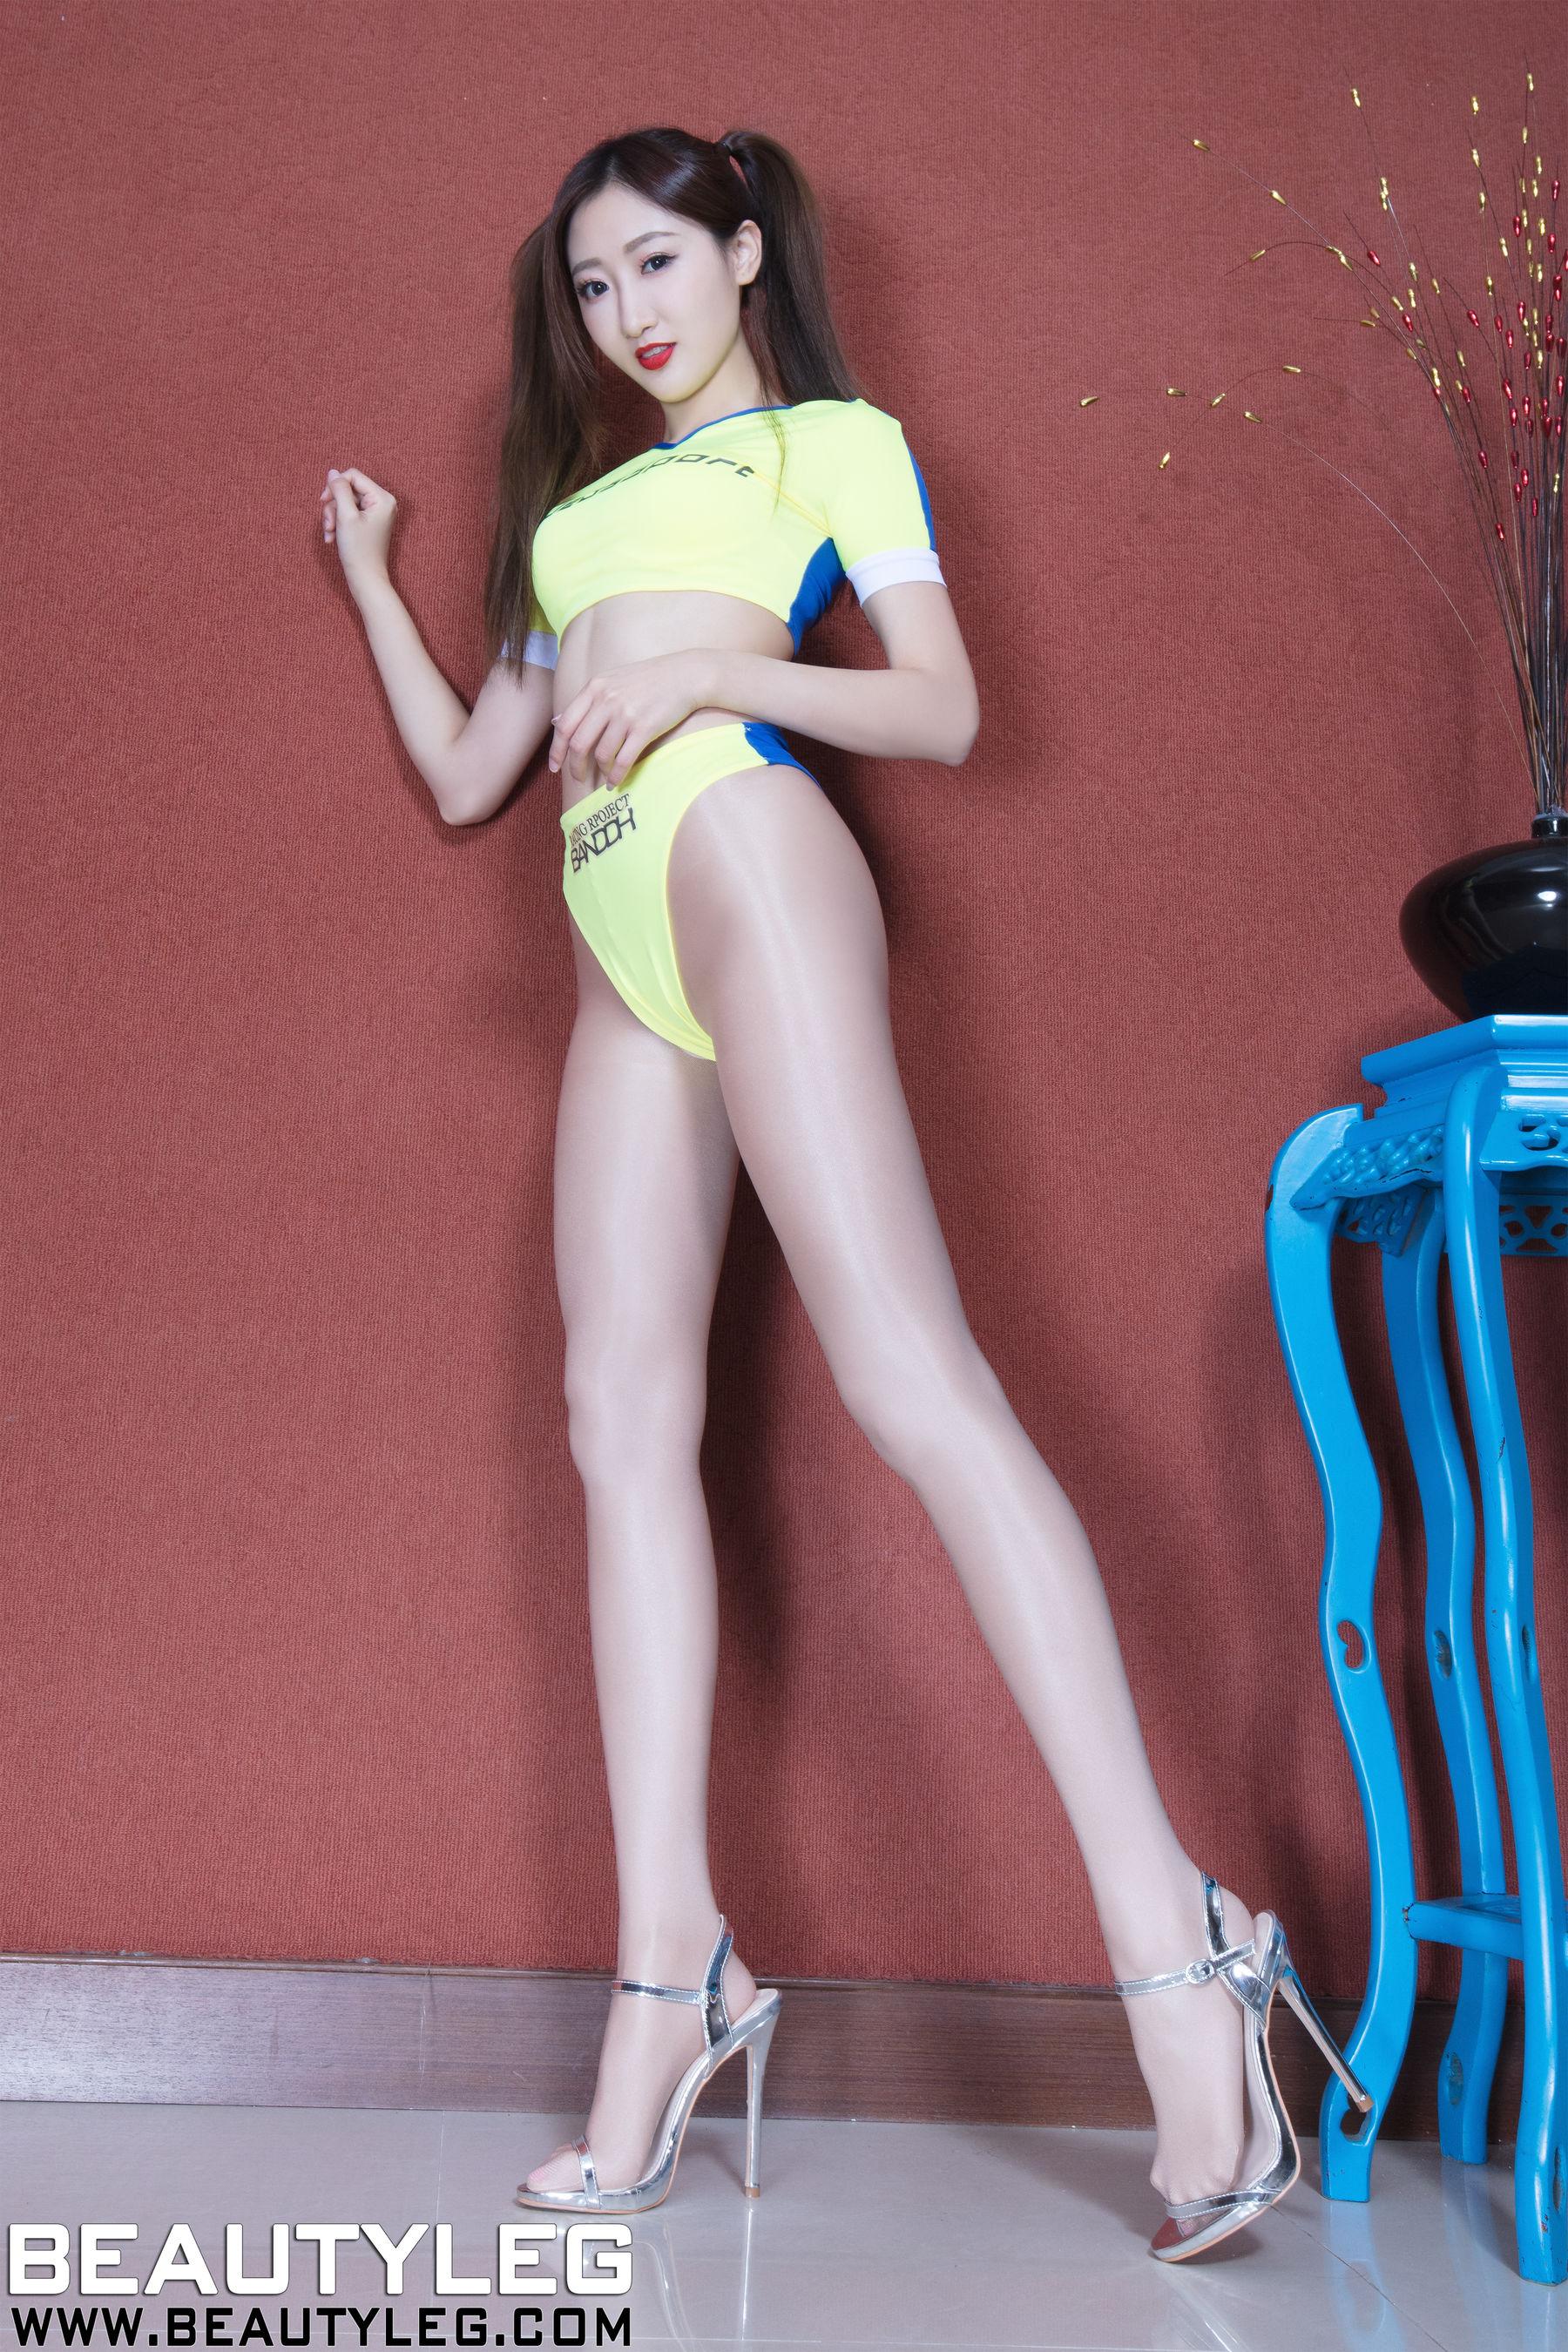 VOL.1667 [Beautyleg]制服美腿高叉泳装长腿美女:腿模Minnie(Minnie)高品质写真套图(51P)